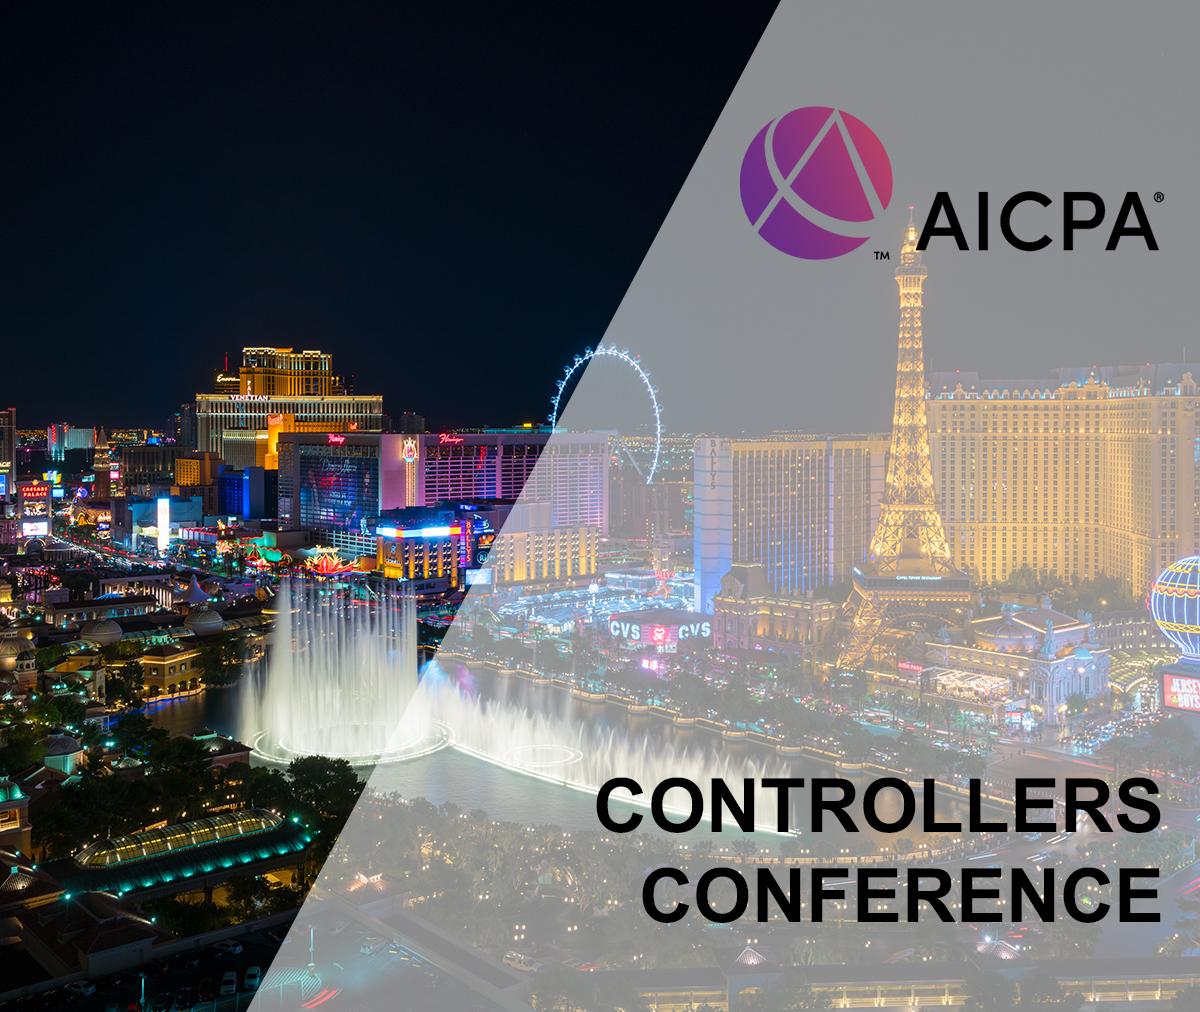 AICPA Controllers